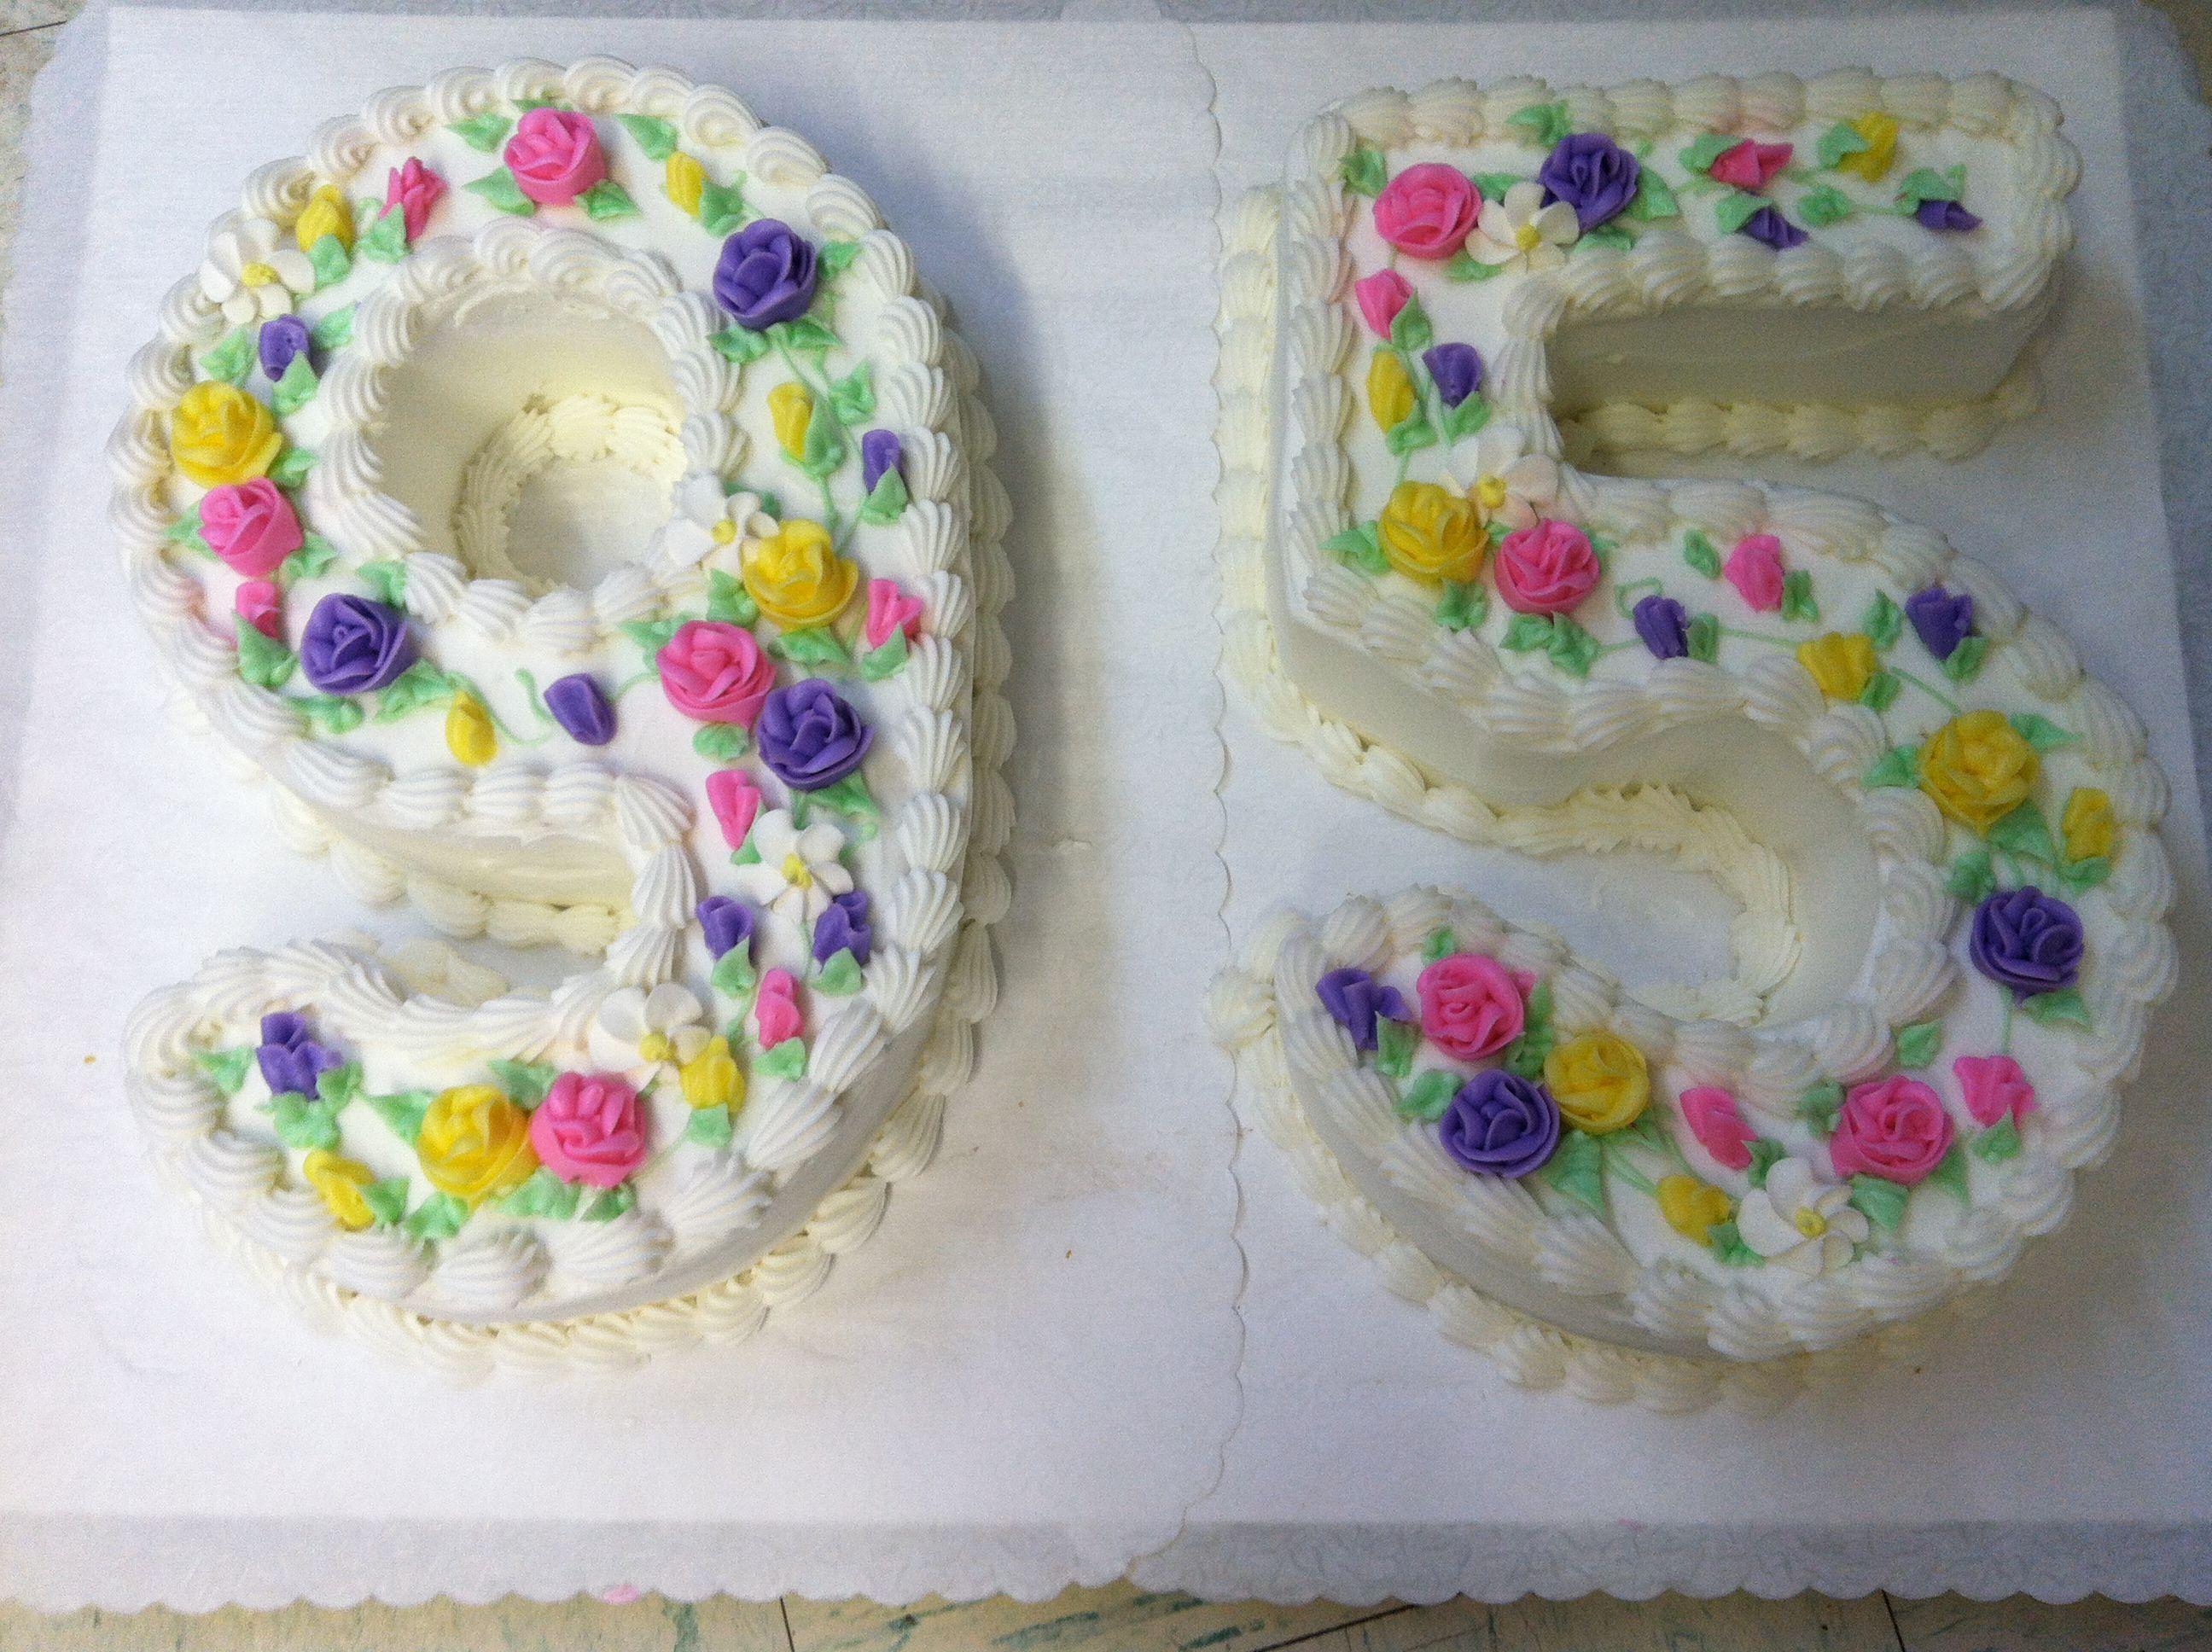 95 Birthday Cake With Images 7th Birthday Cakes 95 Birthday